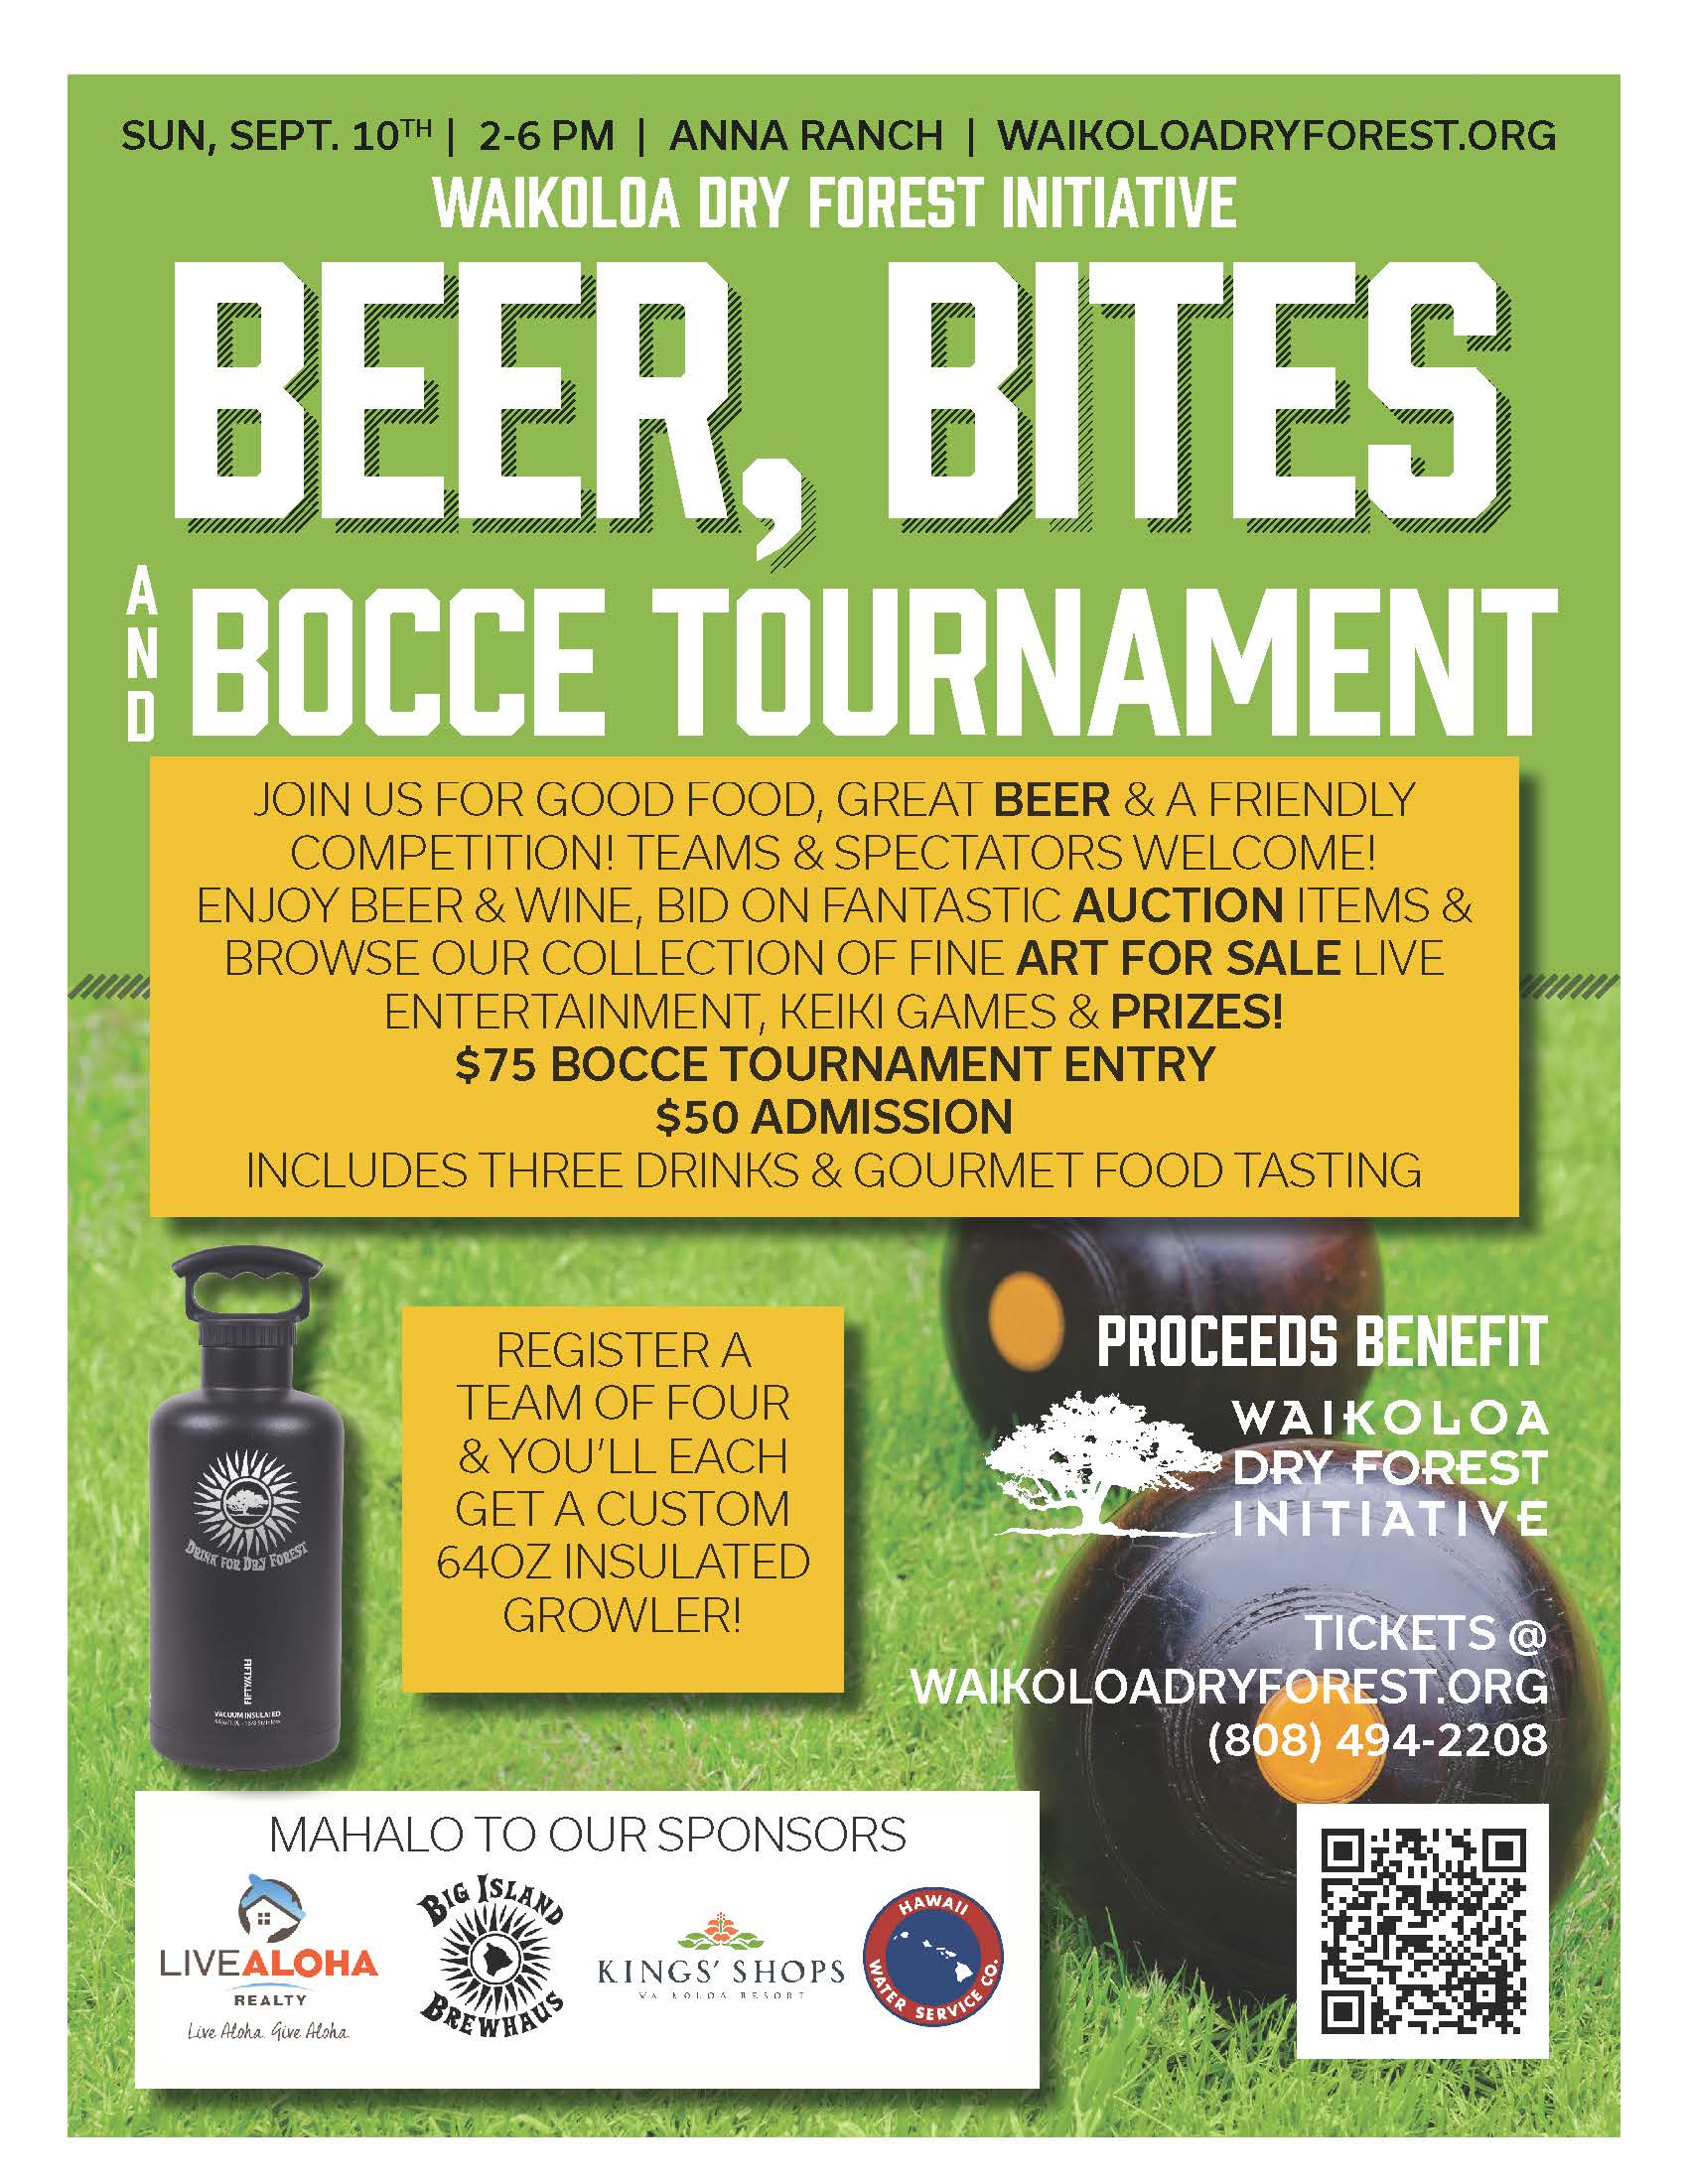 Beer, Bites & Bocce